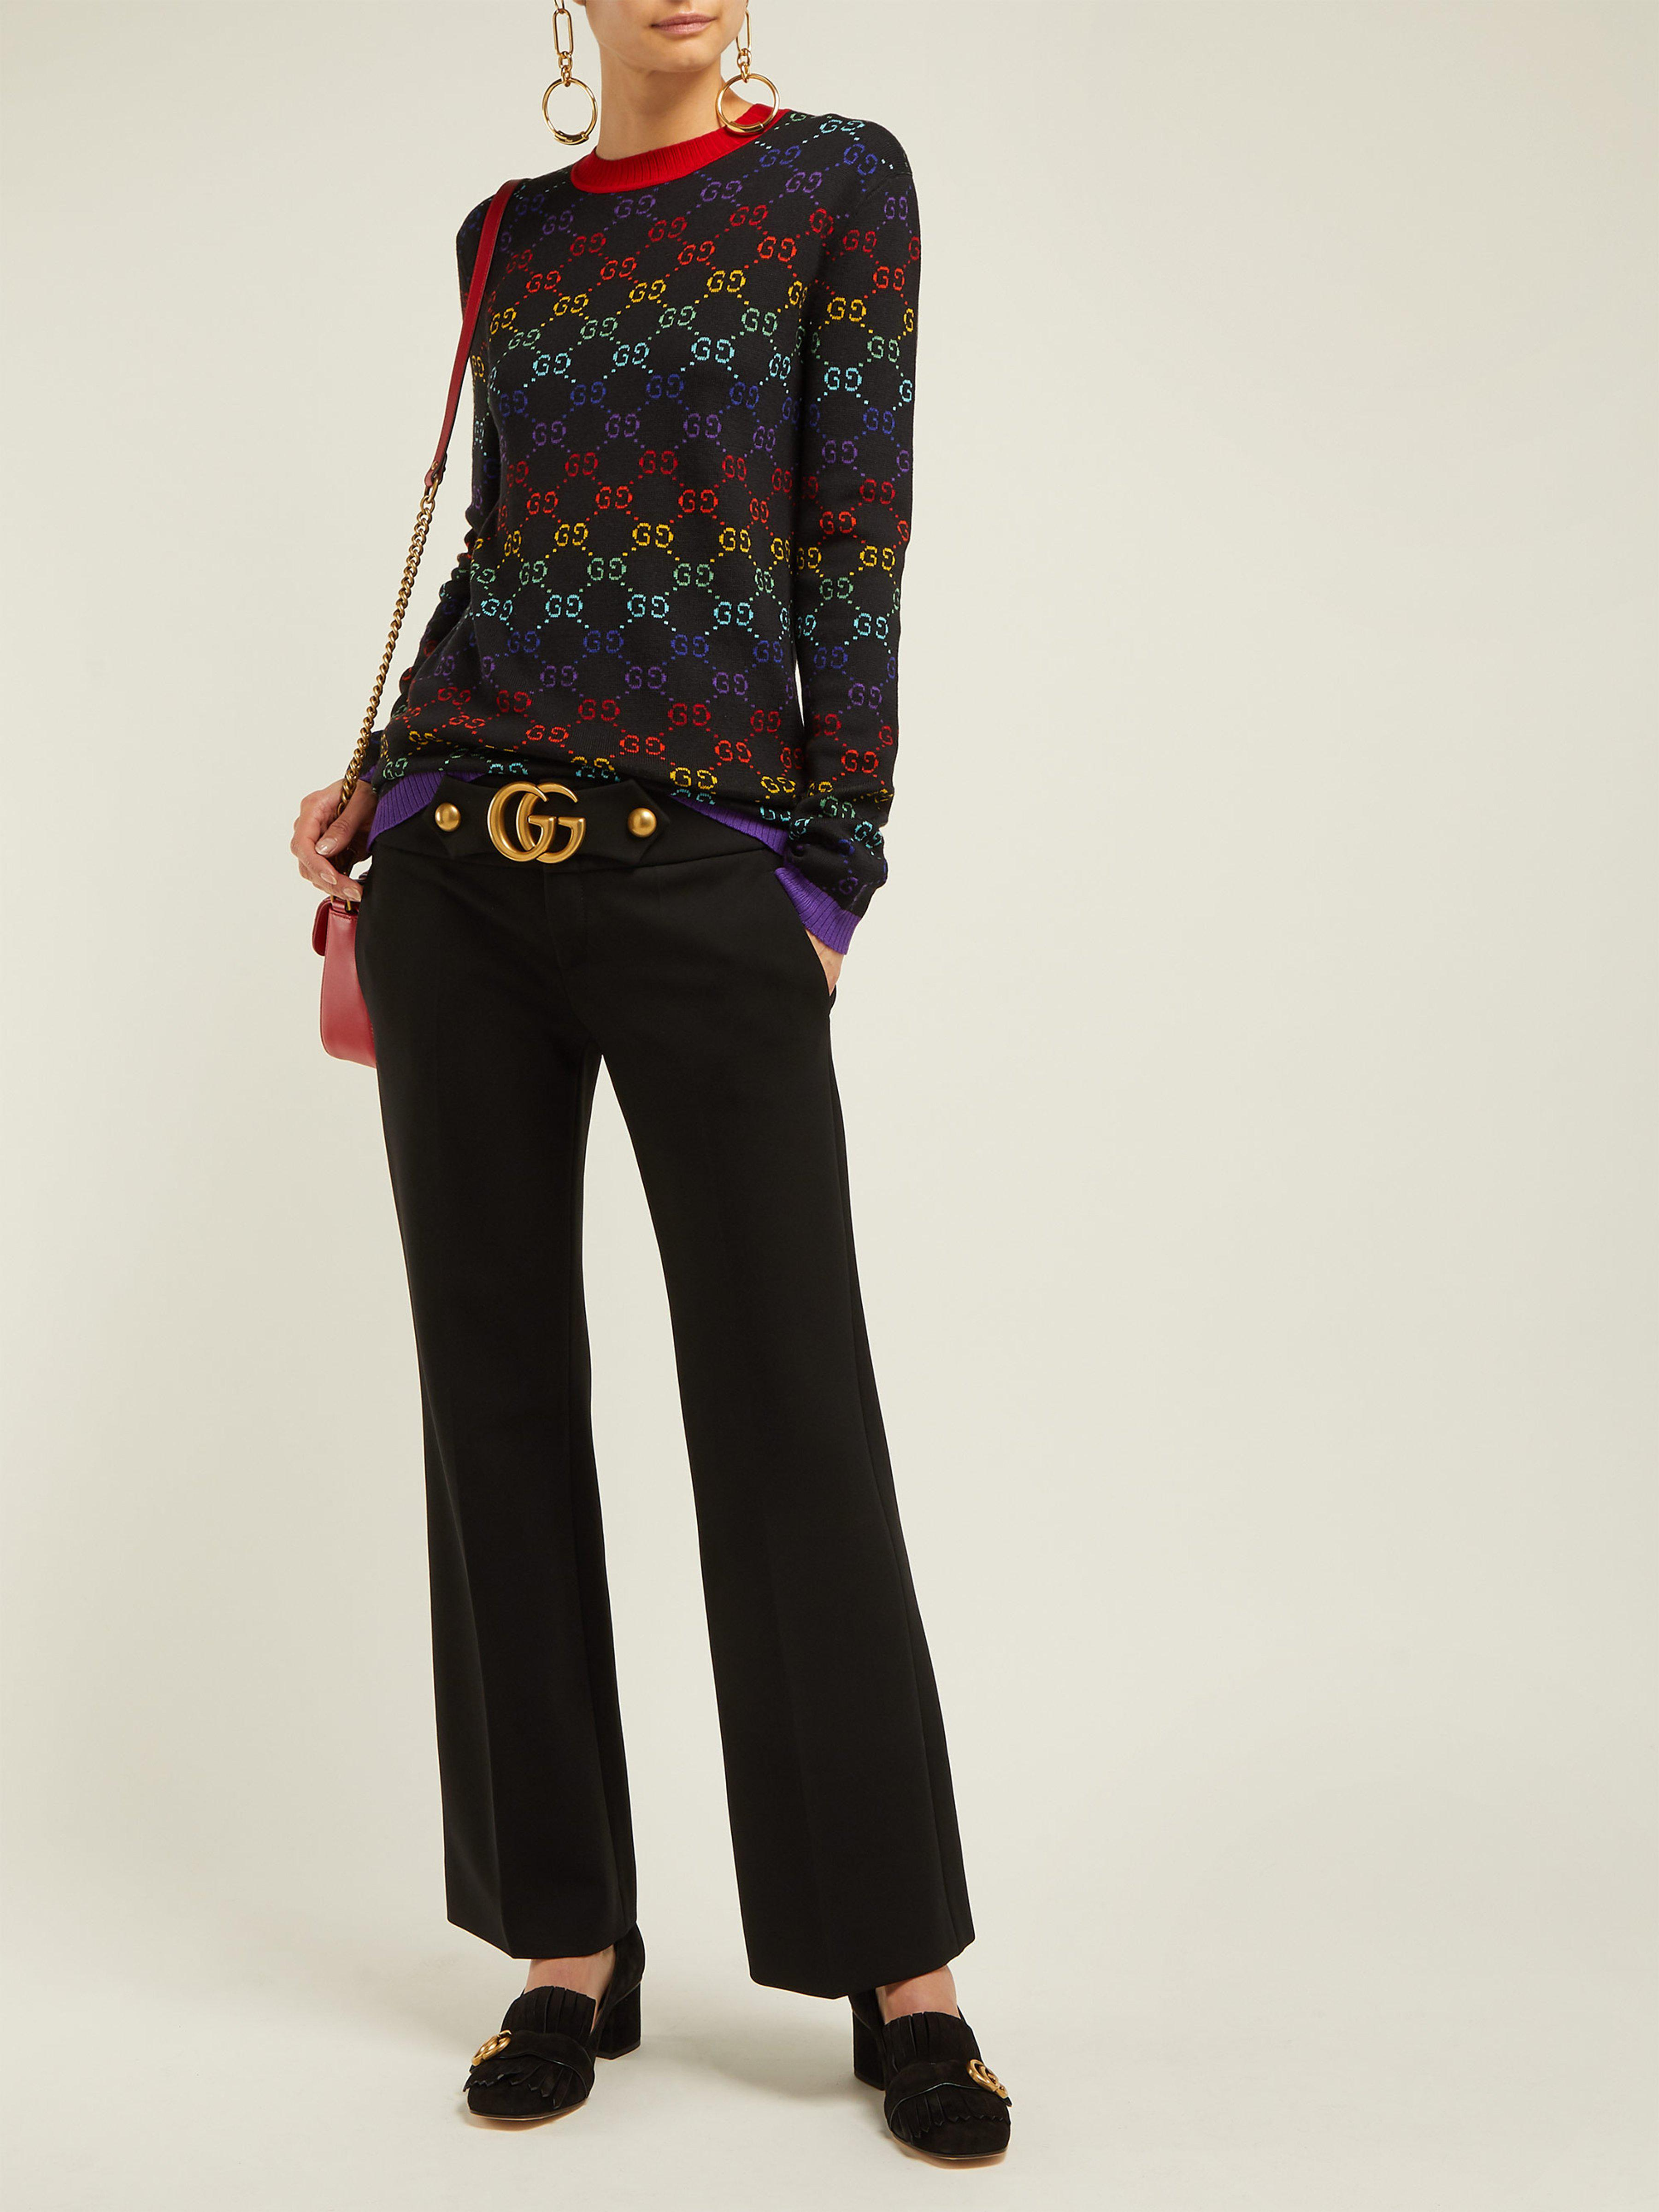 6c87229df Gucci Gg Jacquard Wool Sweater in Black - Lyst